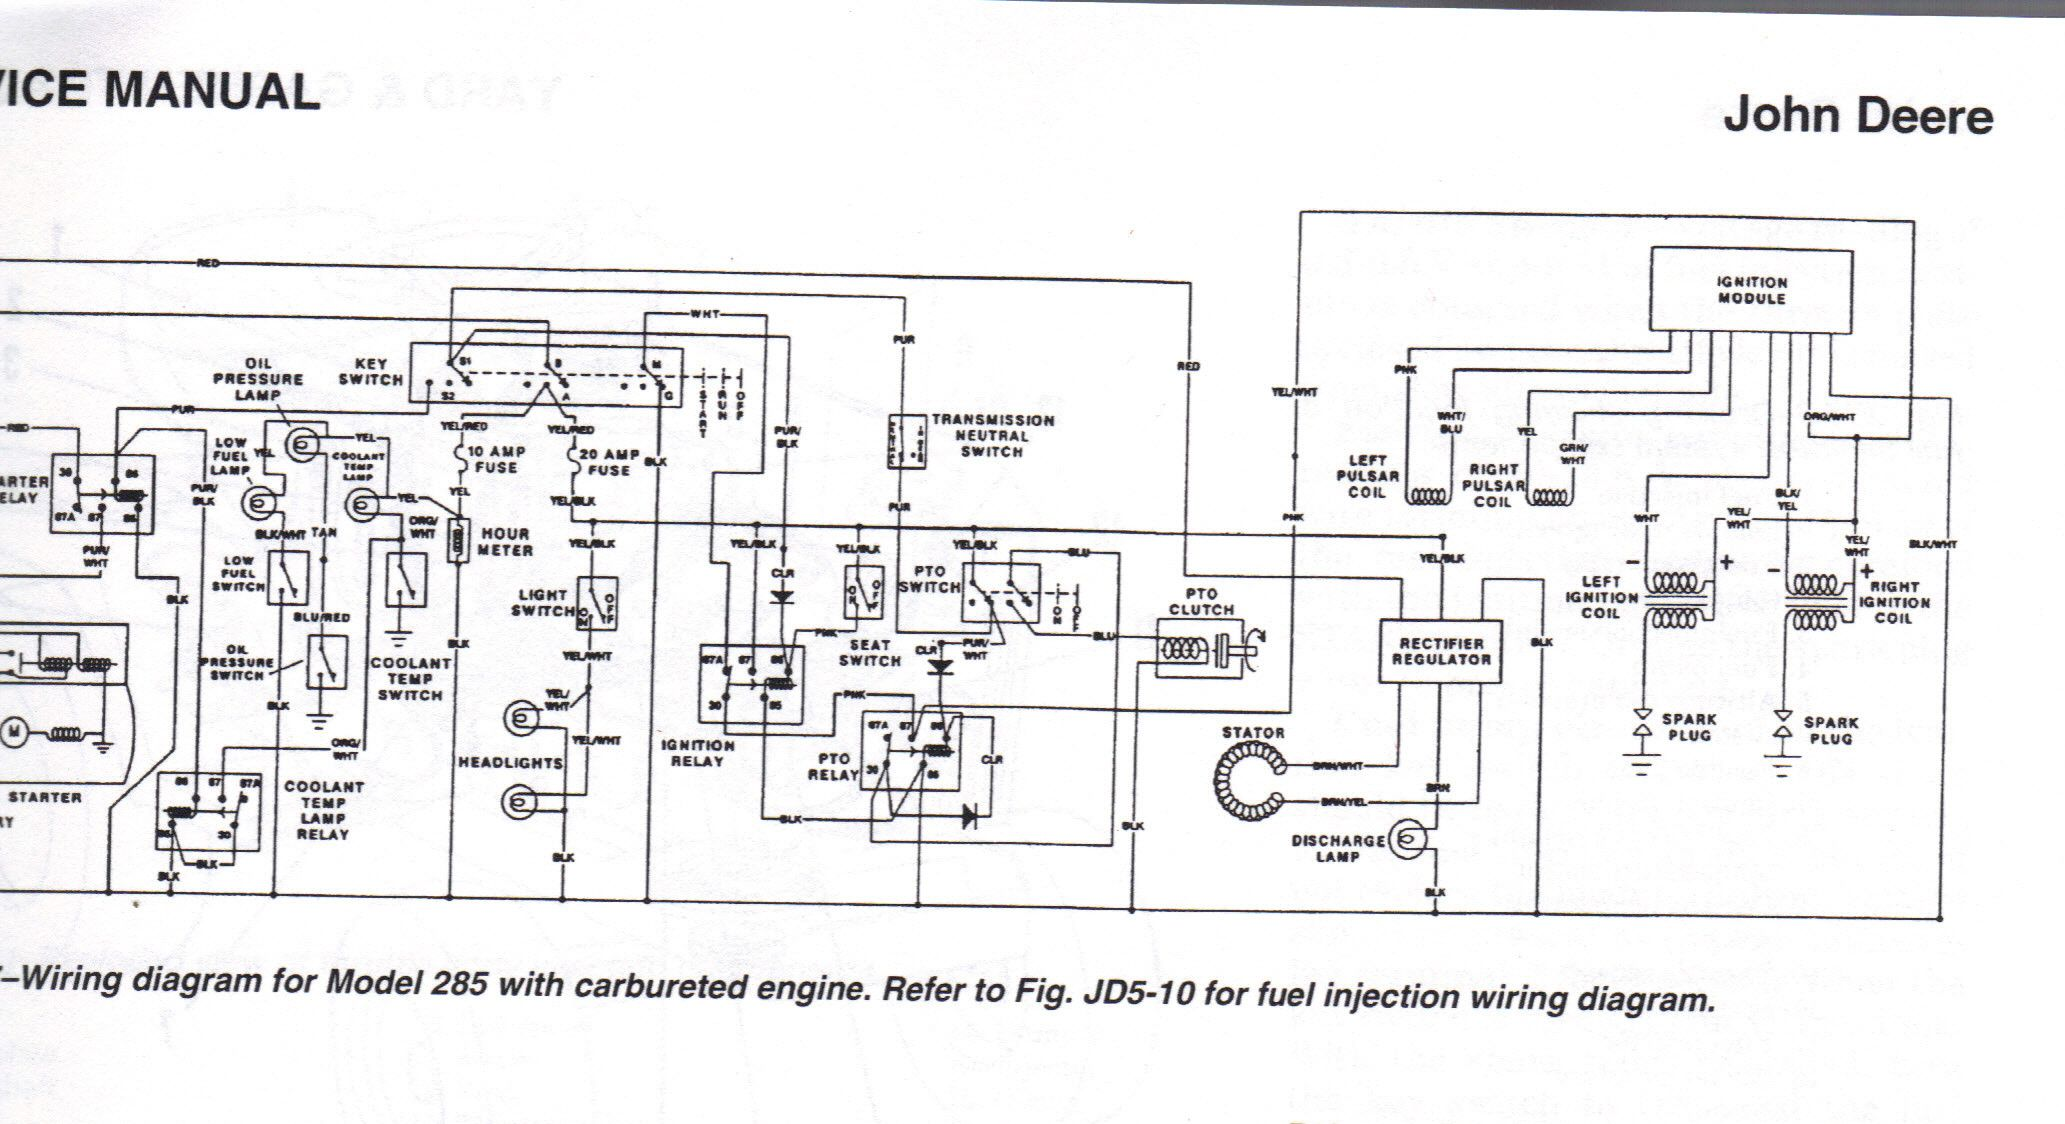 medium resolution of john deere wiring diagram to service manual for model 285 with rhjohn deere wiring diagram to